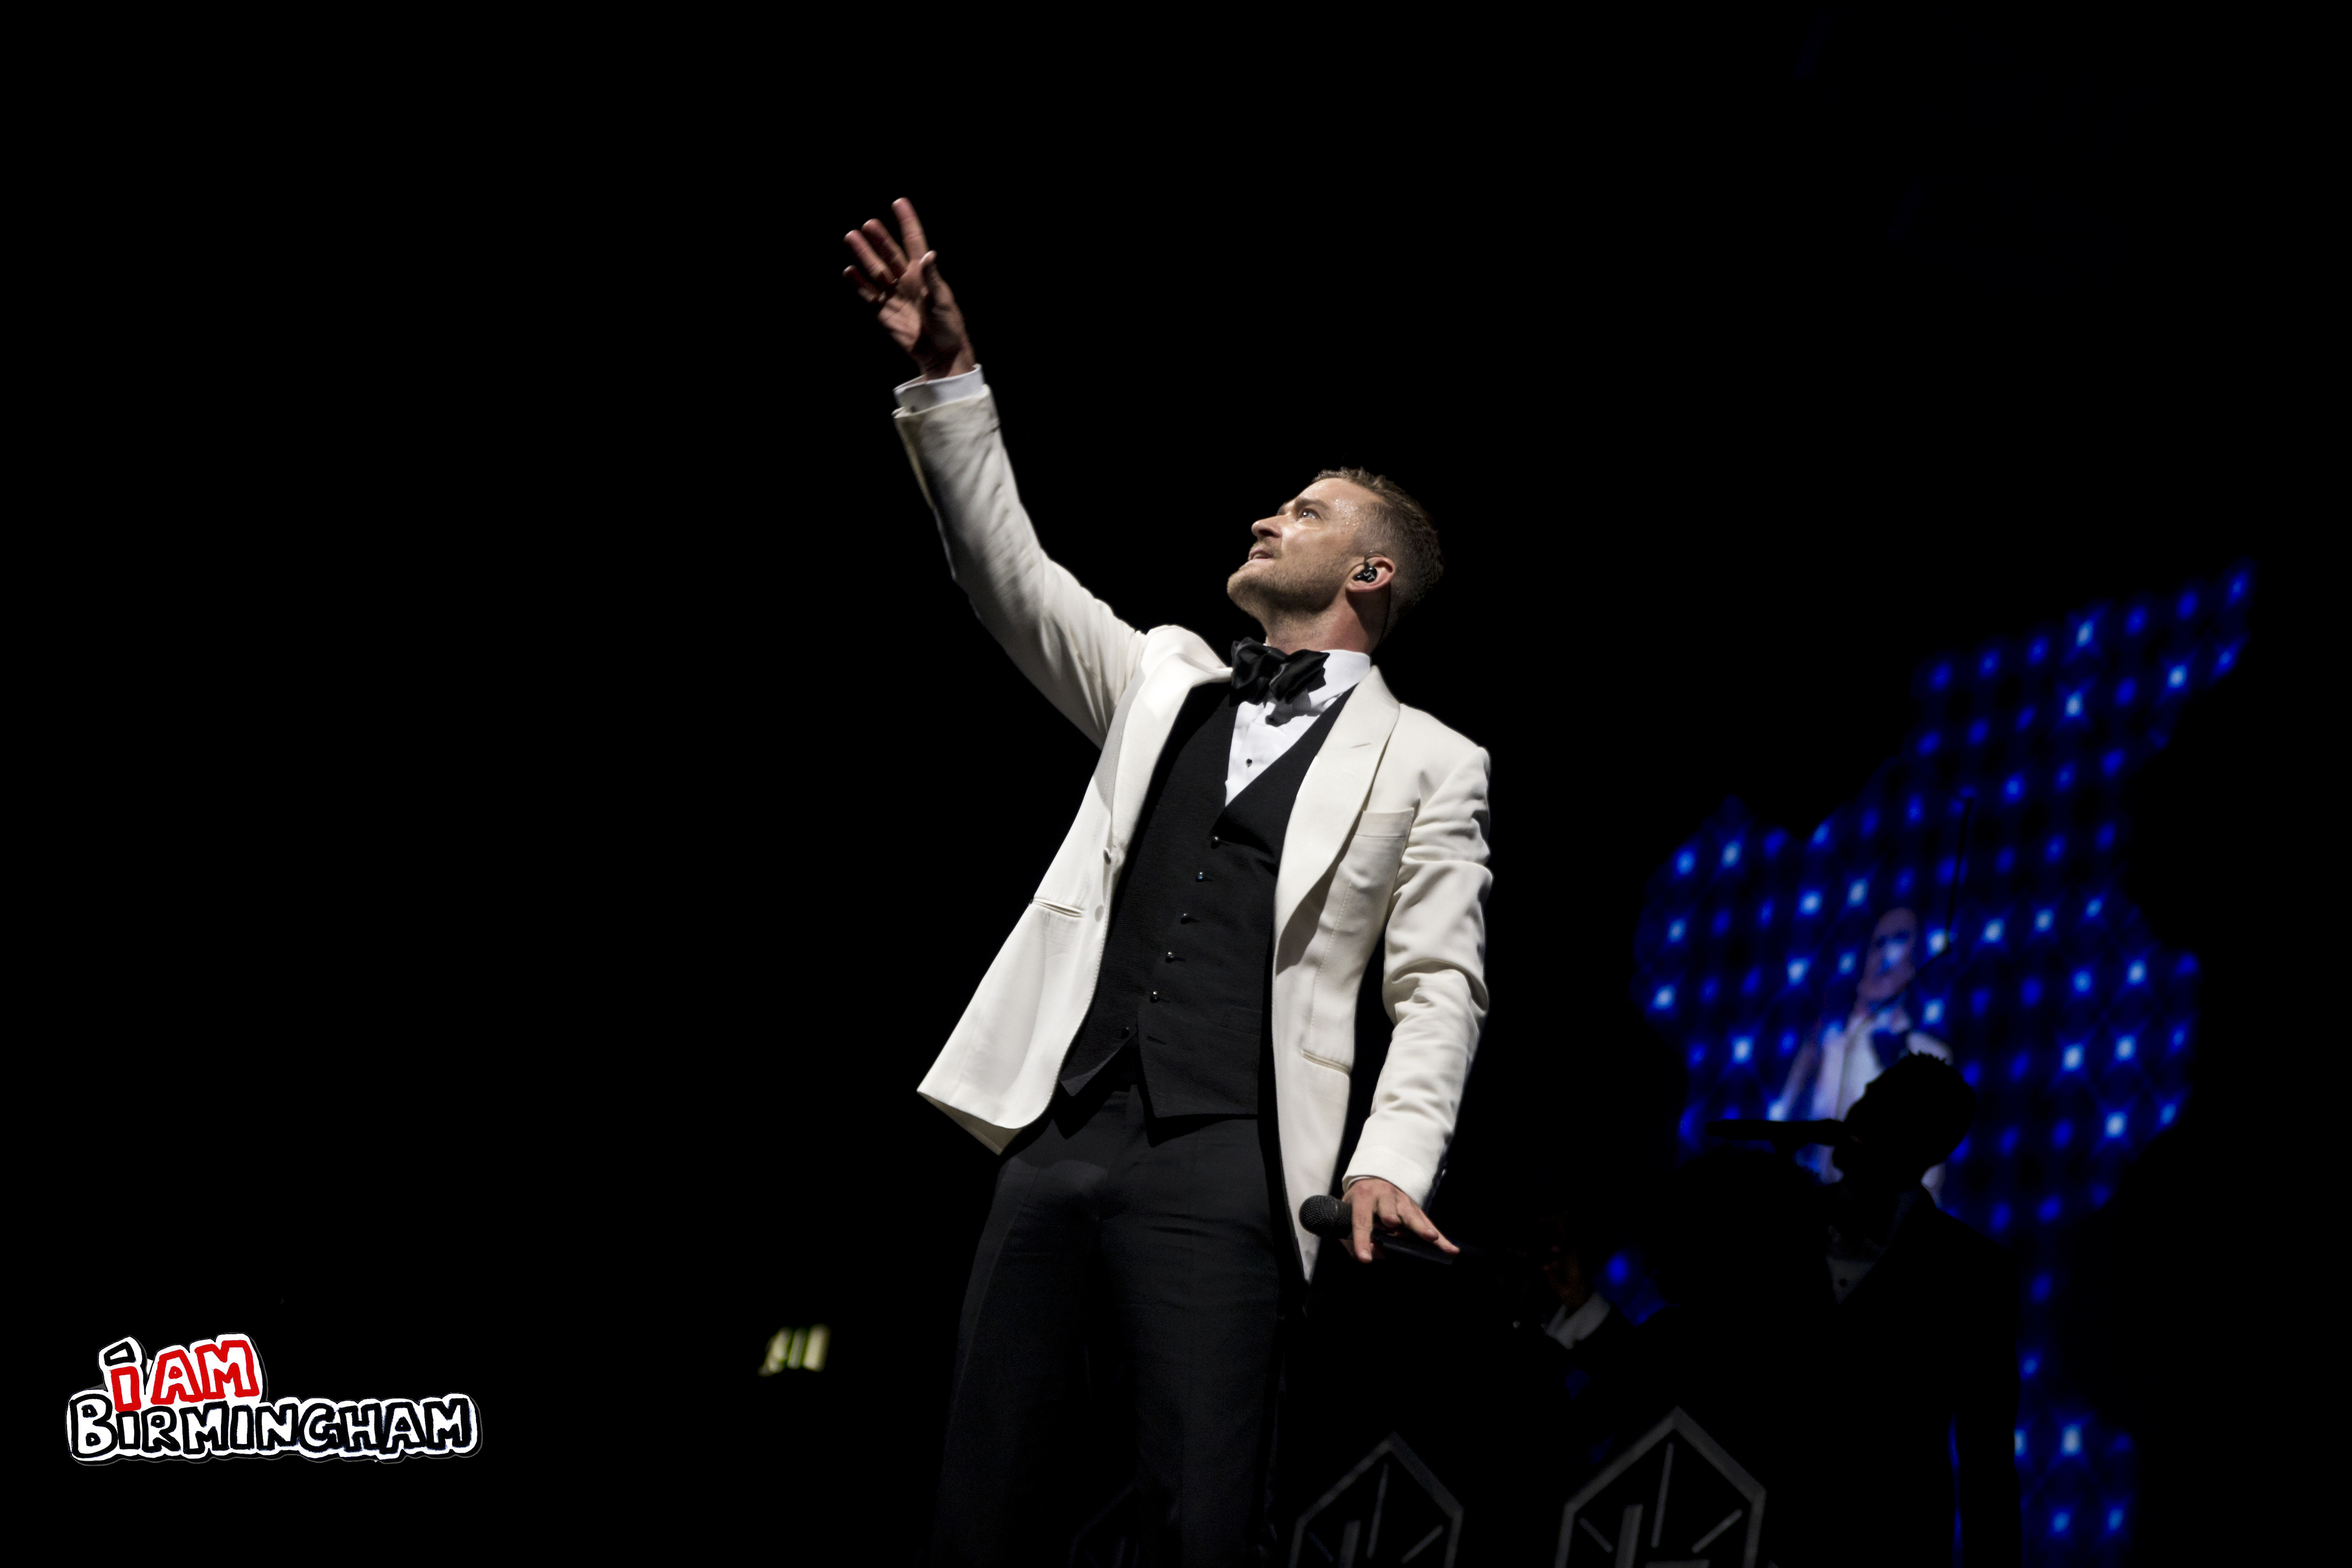 World-wide phenomenon Justin Timberlake filled the LG Arena